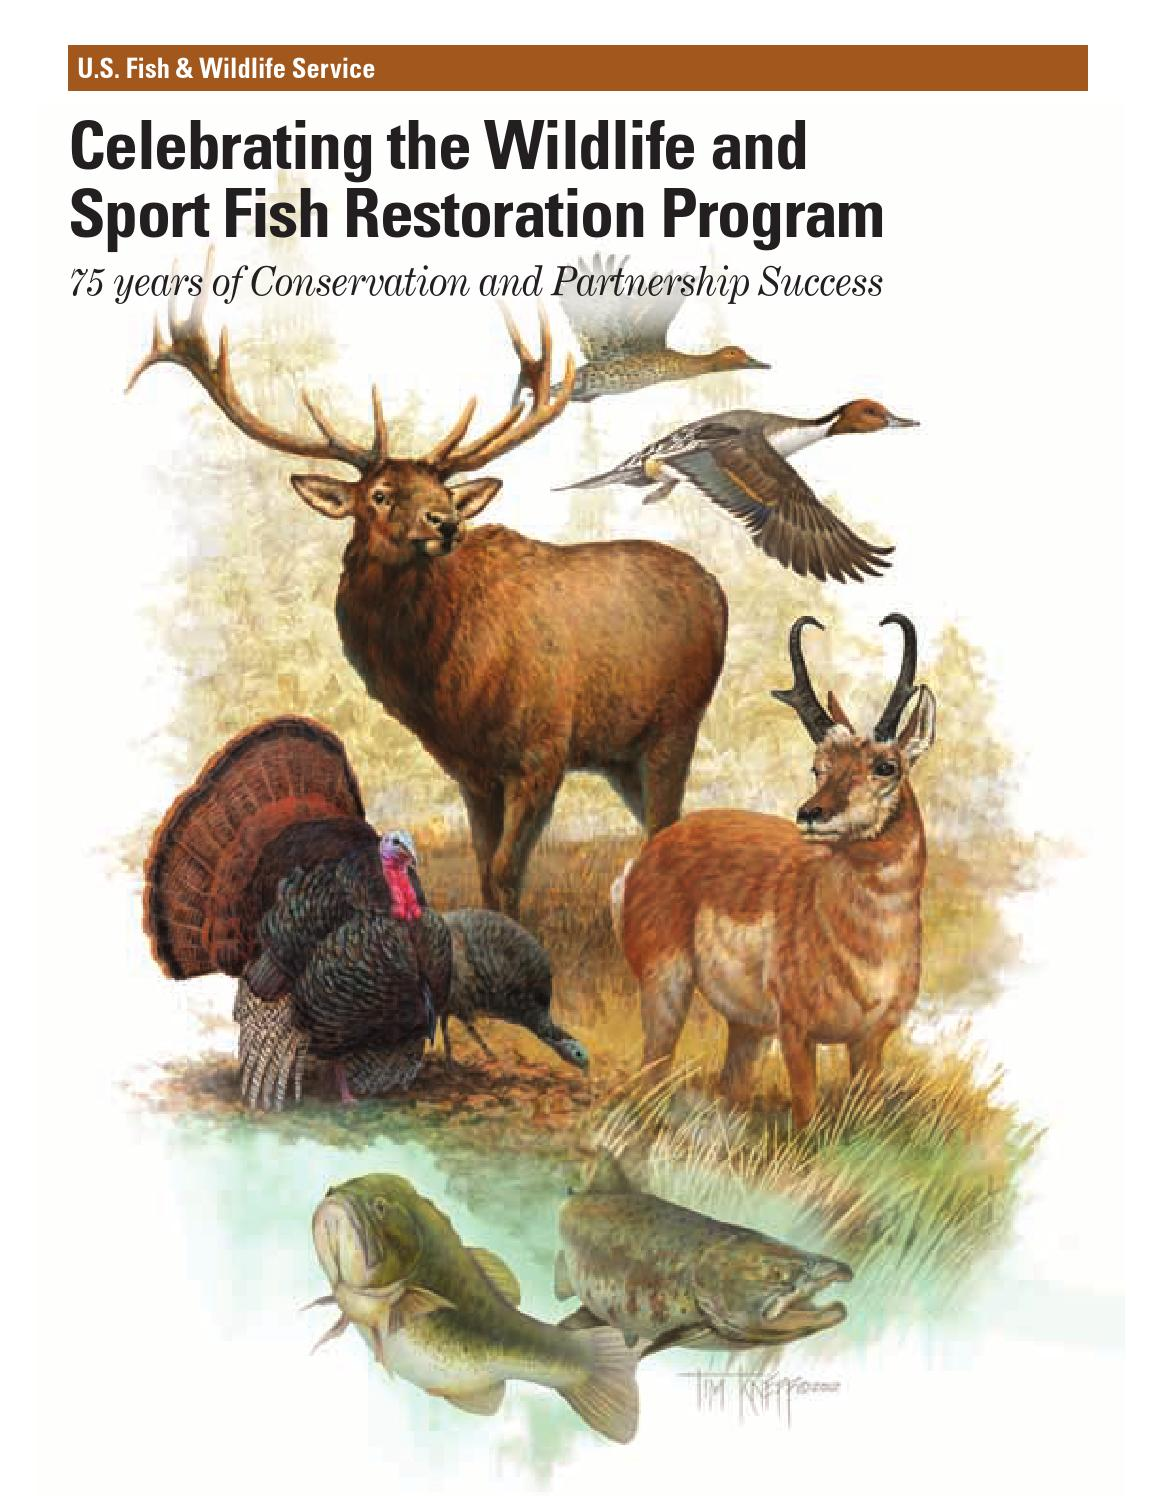 Celebrating the Wildlife and Sport Fish Restoration Program